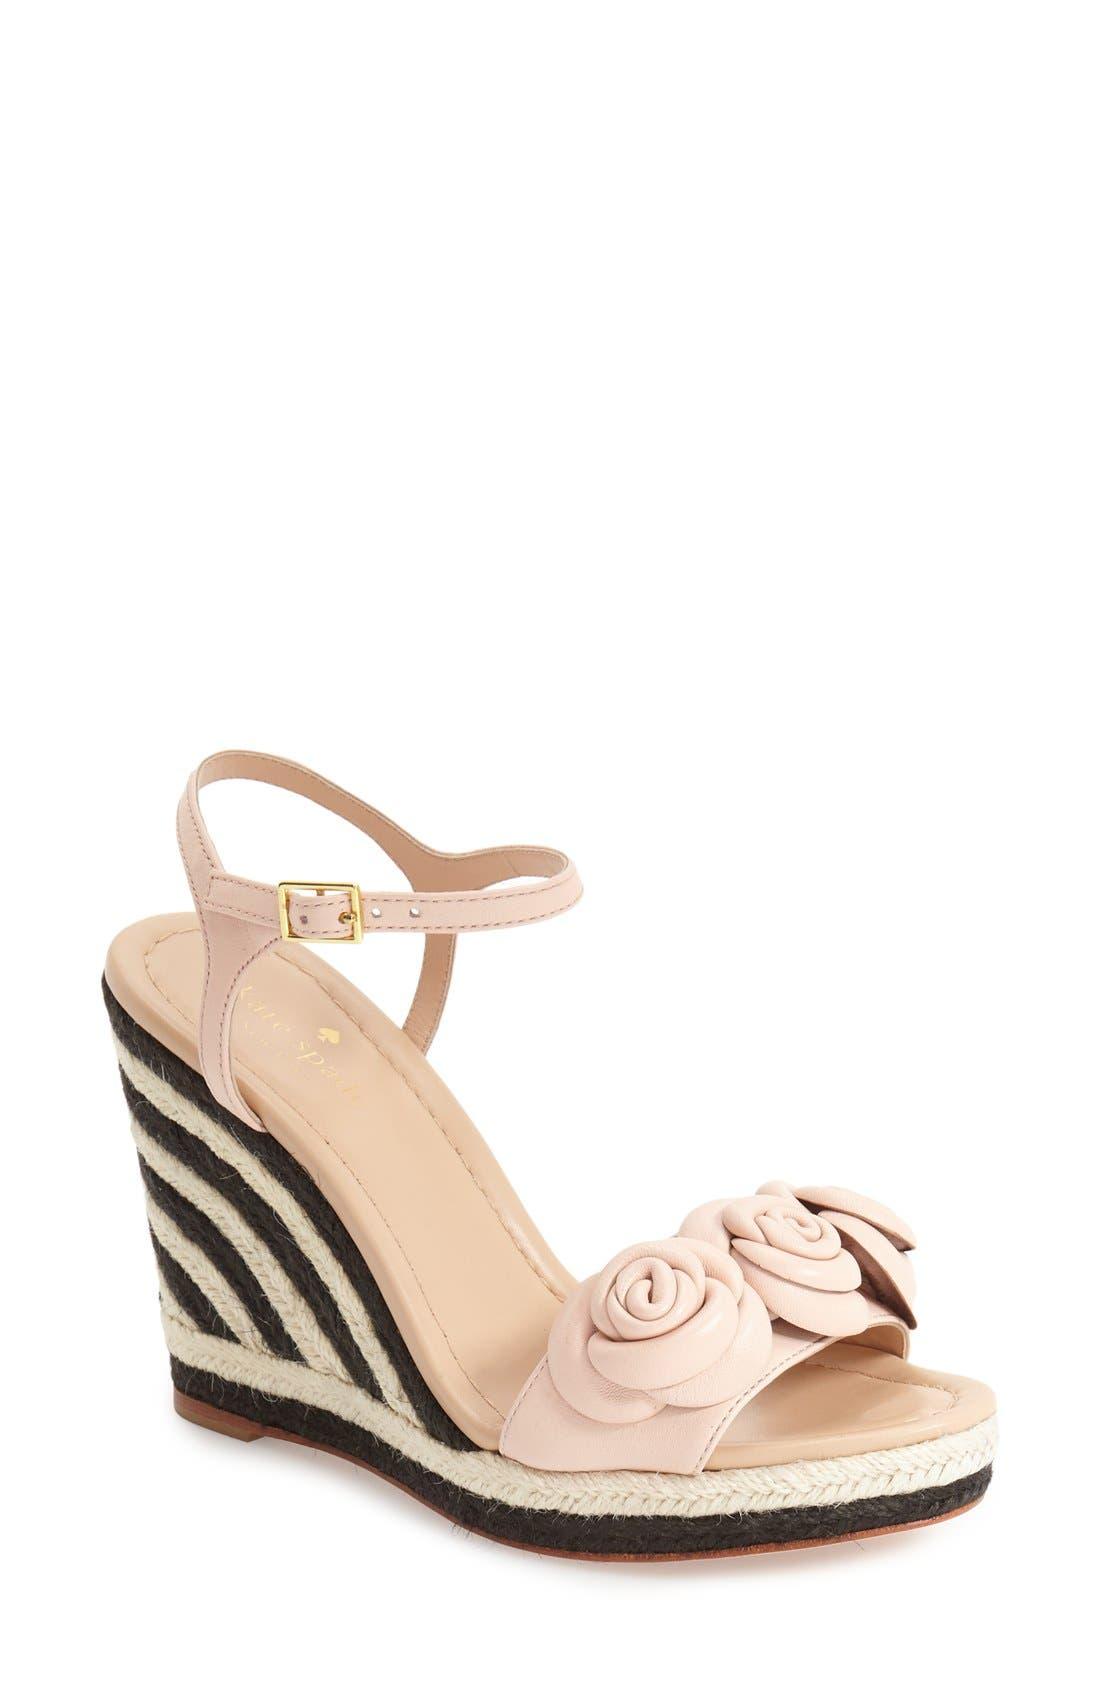 Main Image - kate spade new york 'jill' espadrille wedge sandal (Women)